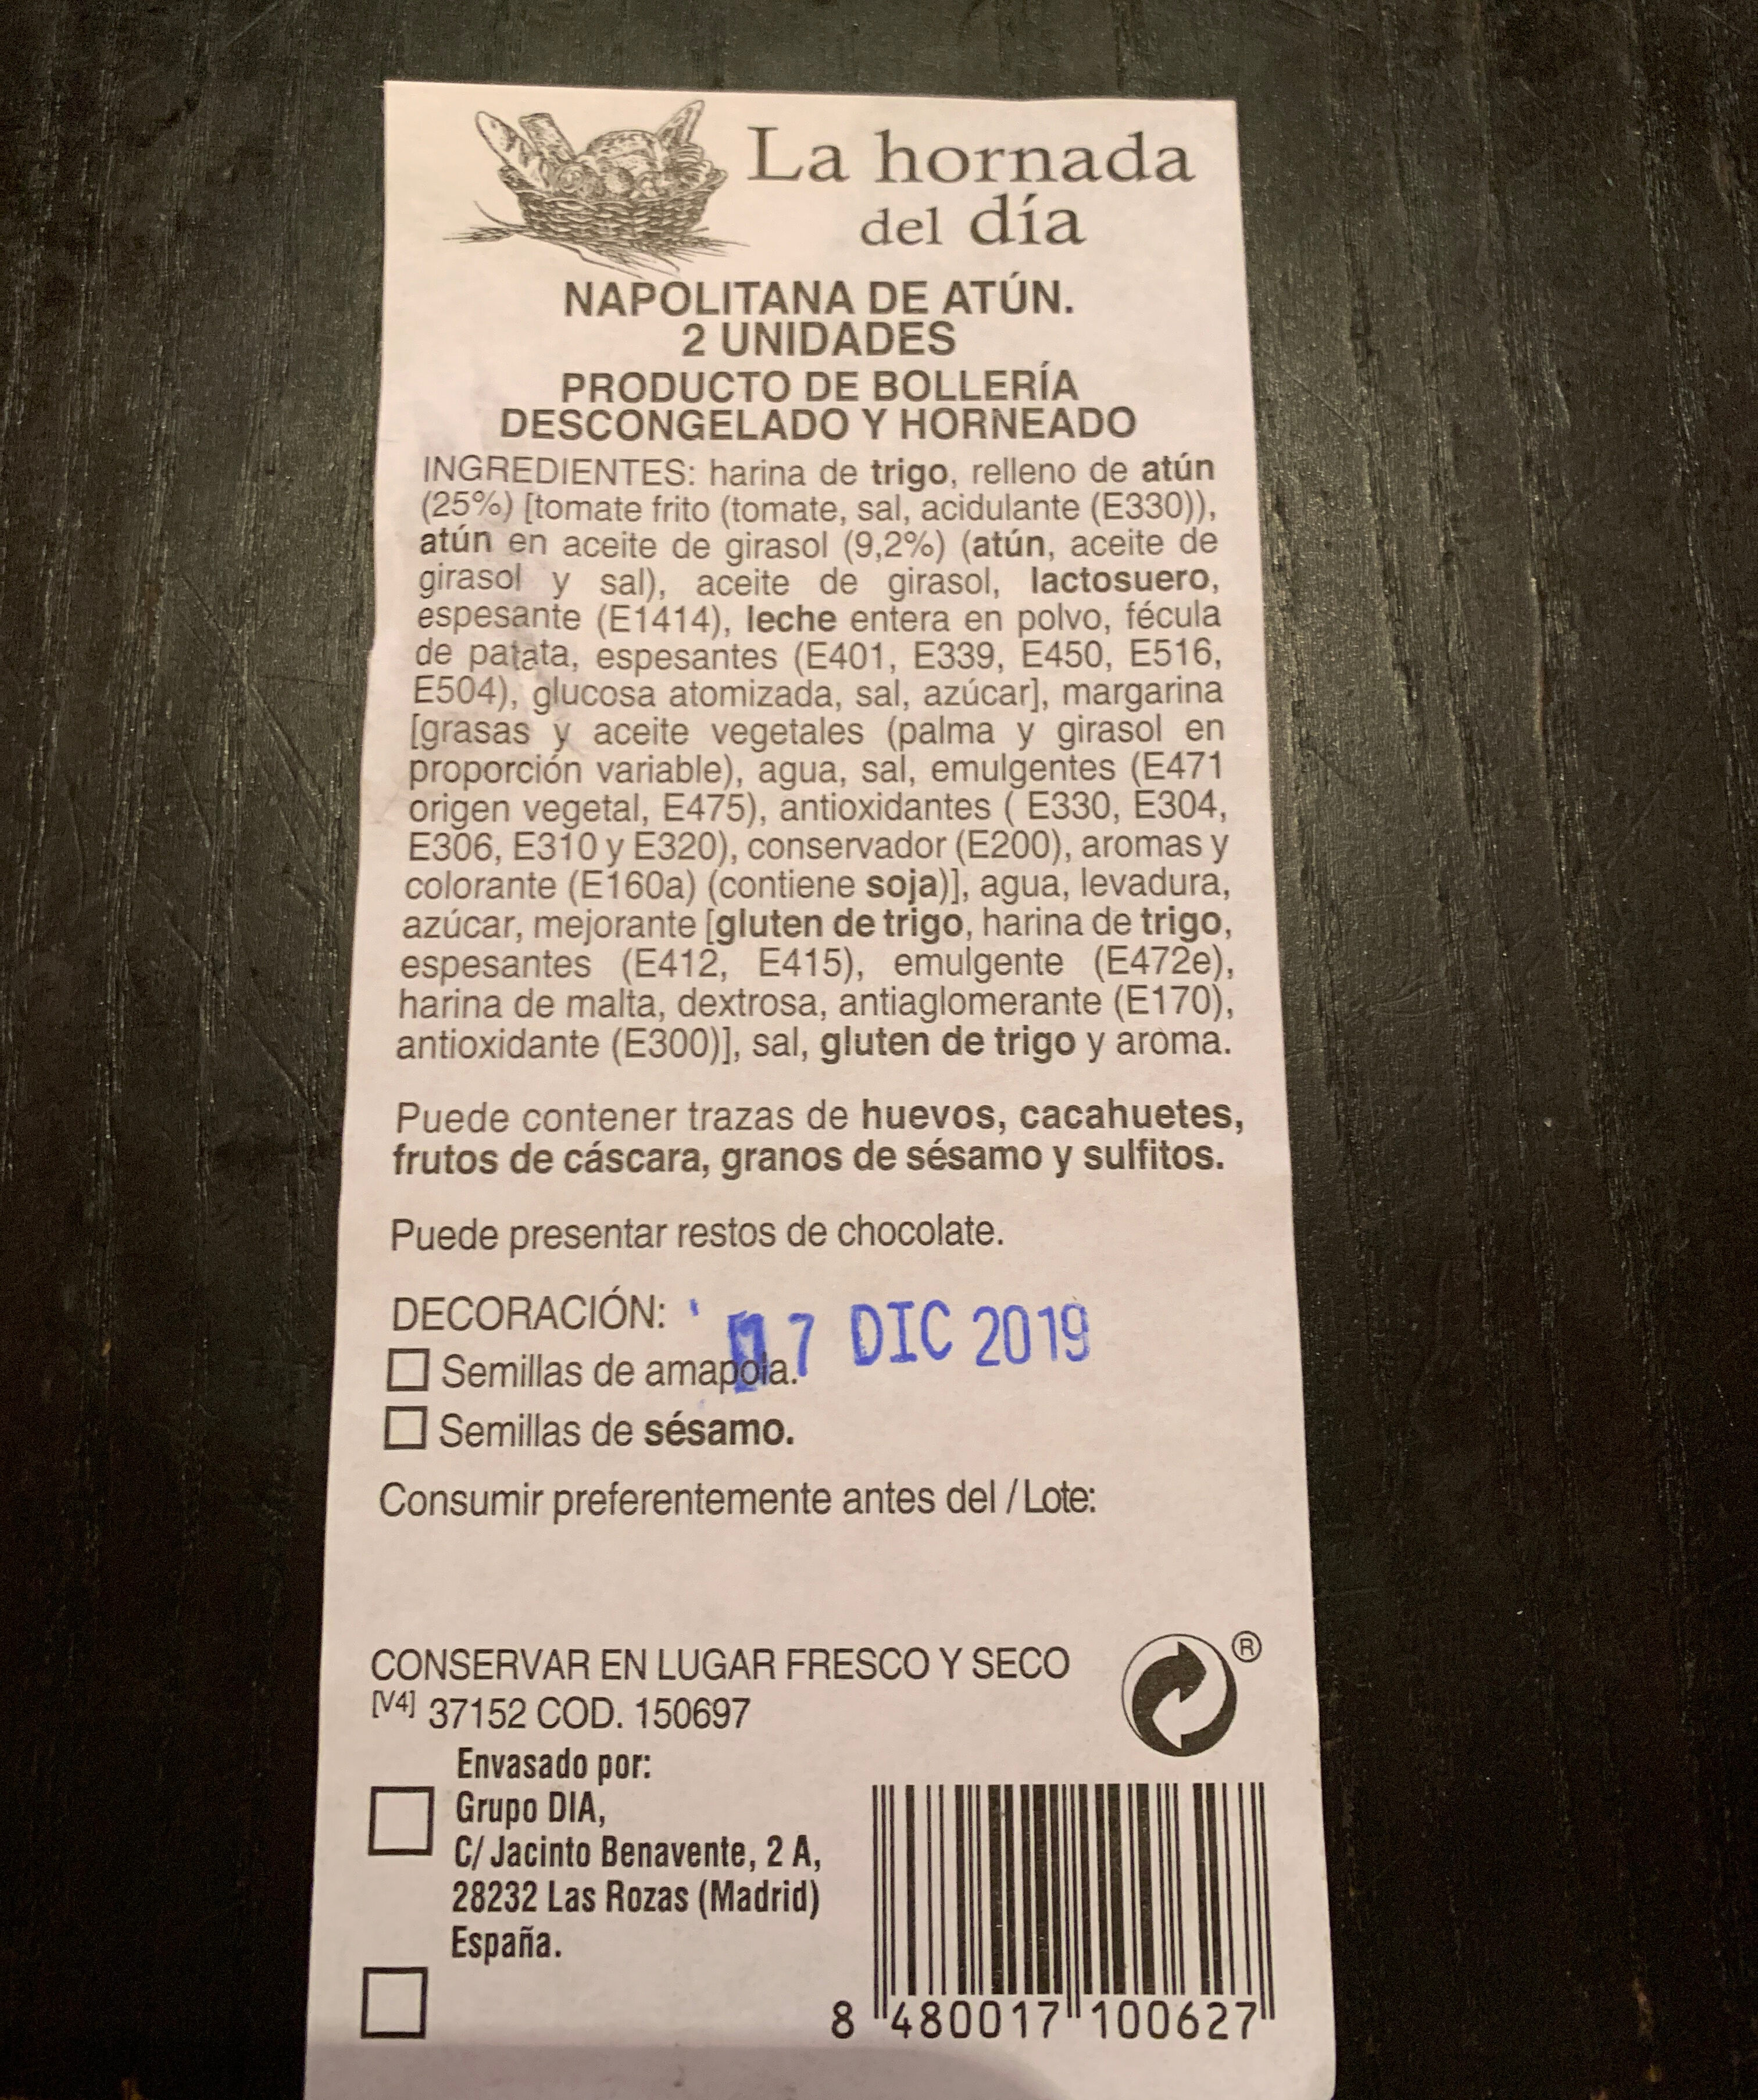 Napolitana de Atún 2 unidades - Ingredientes